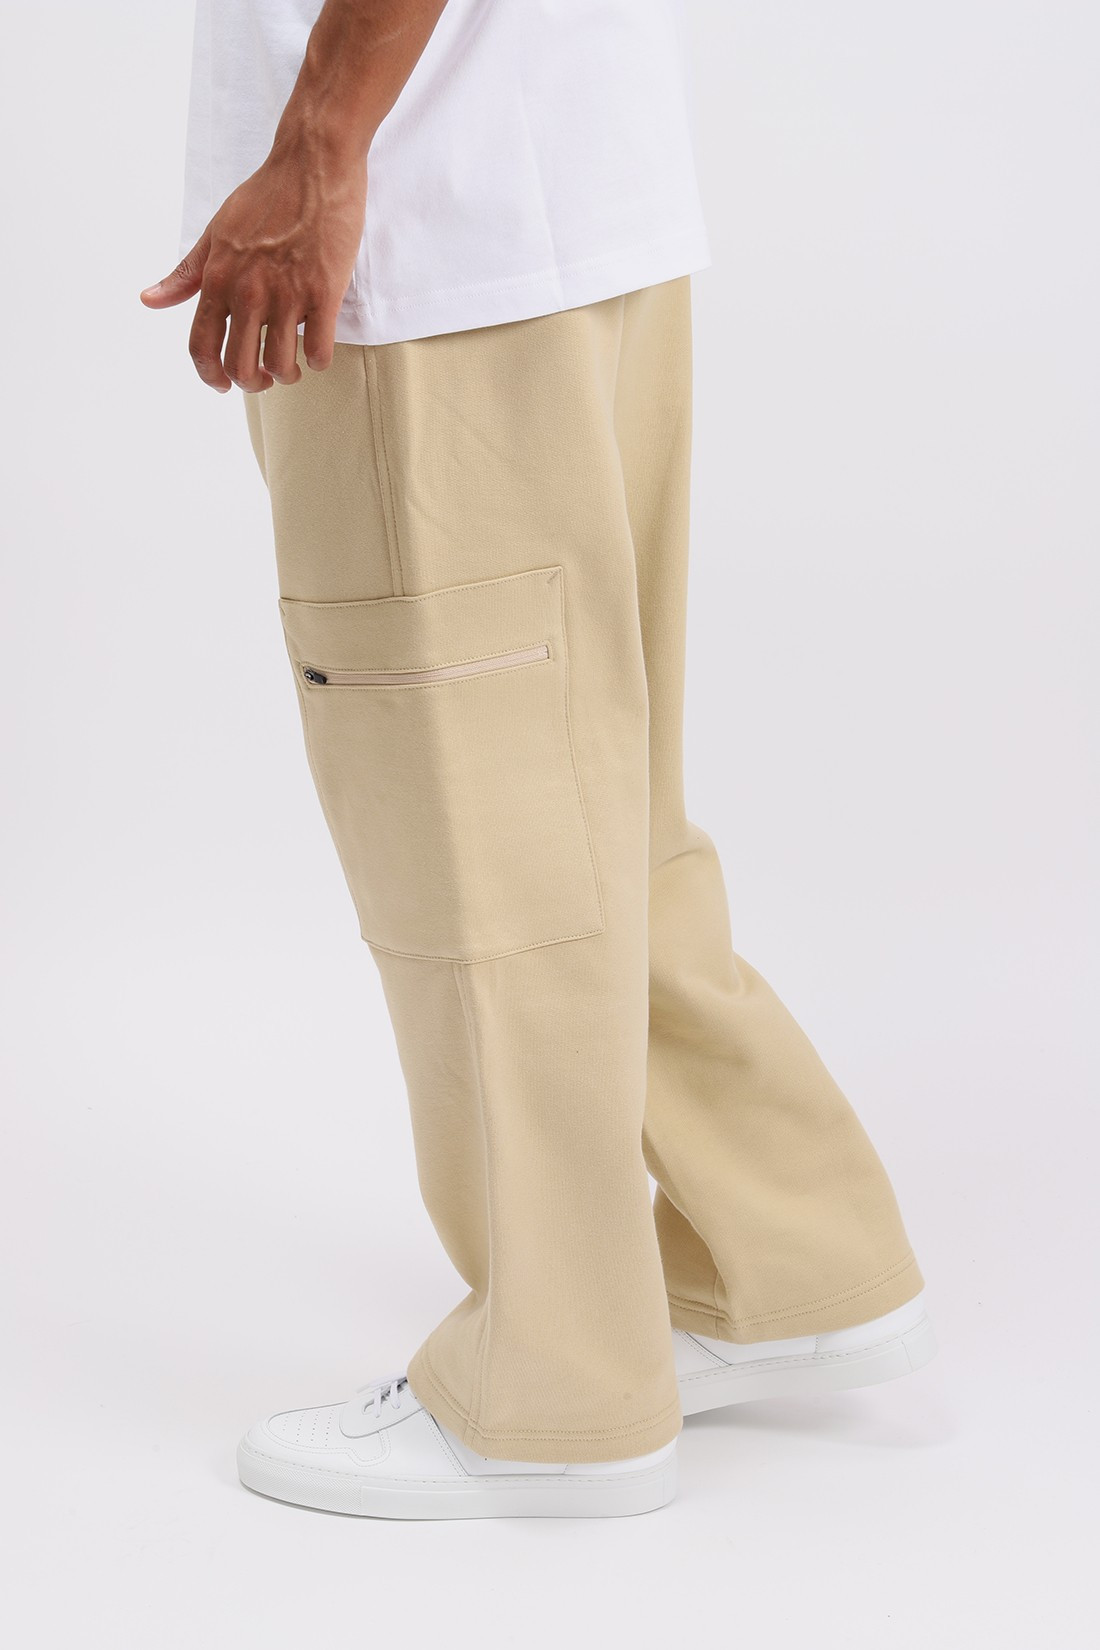 PATTA / Patta basic cargo jogging Pale kaki